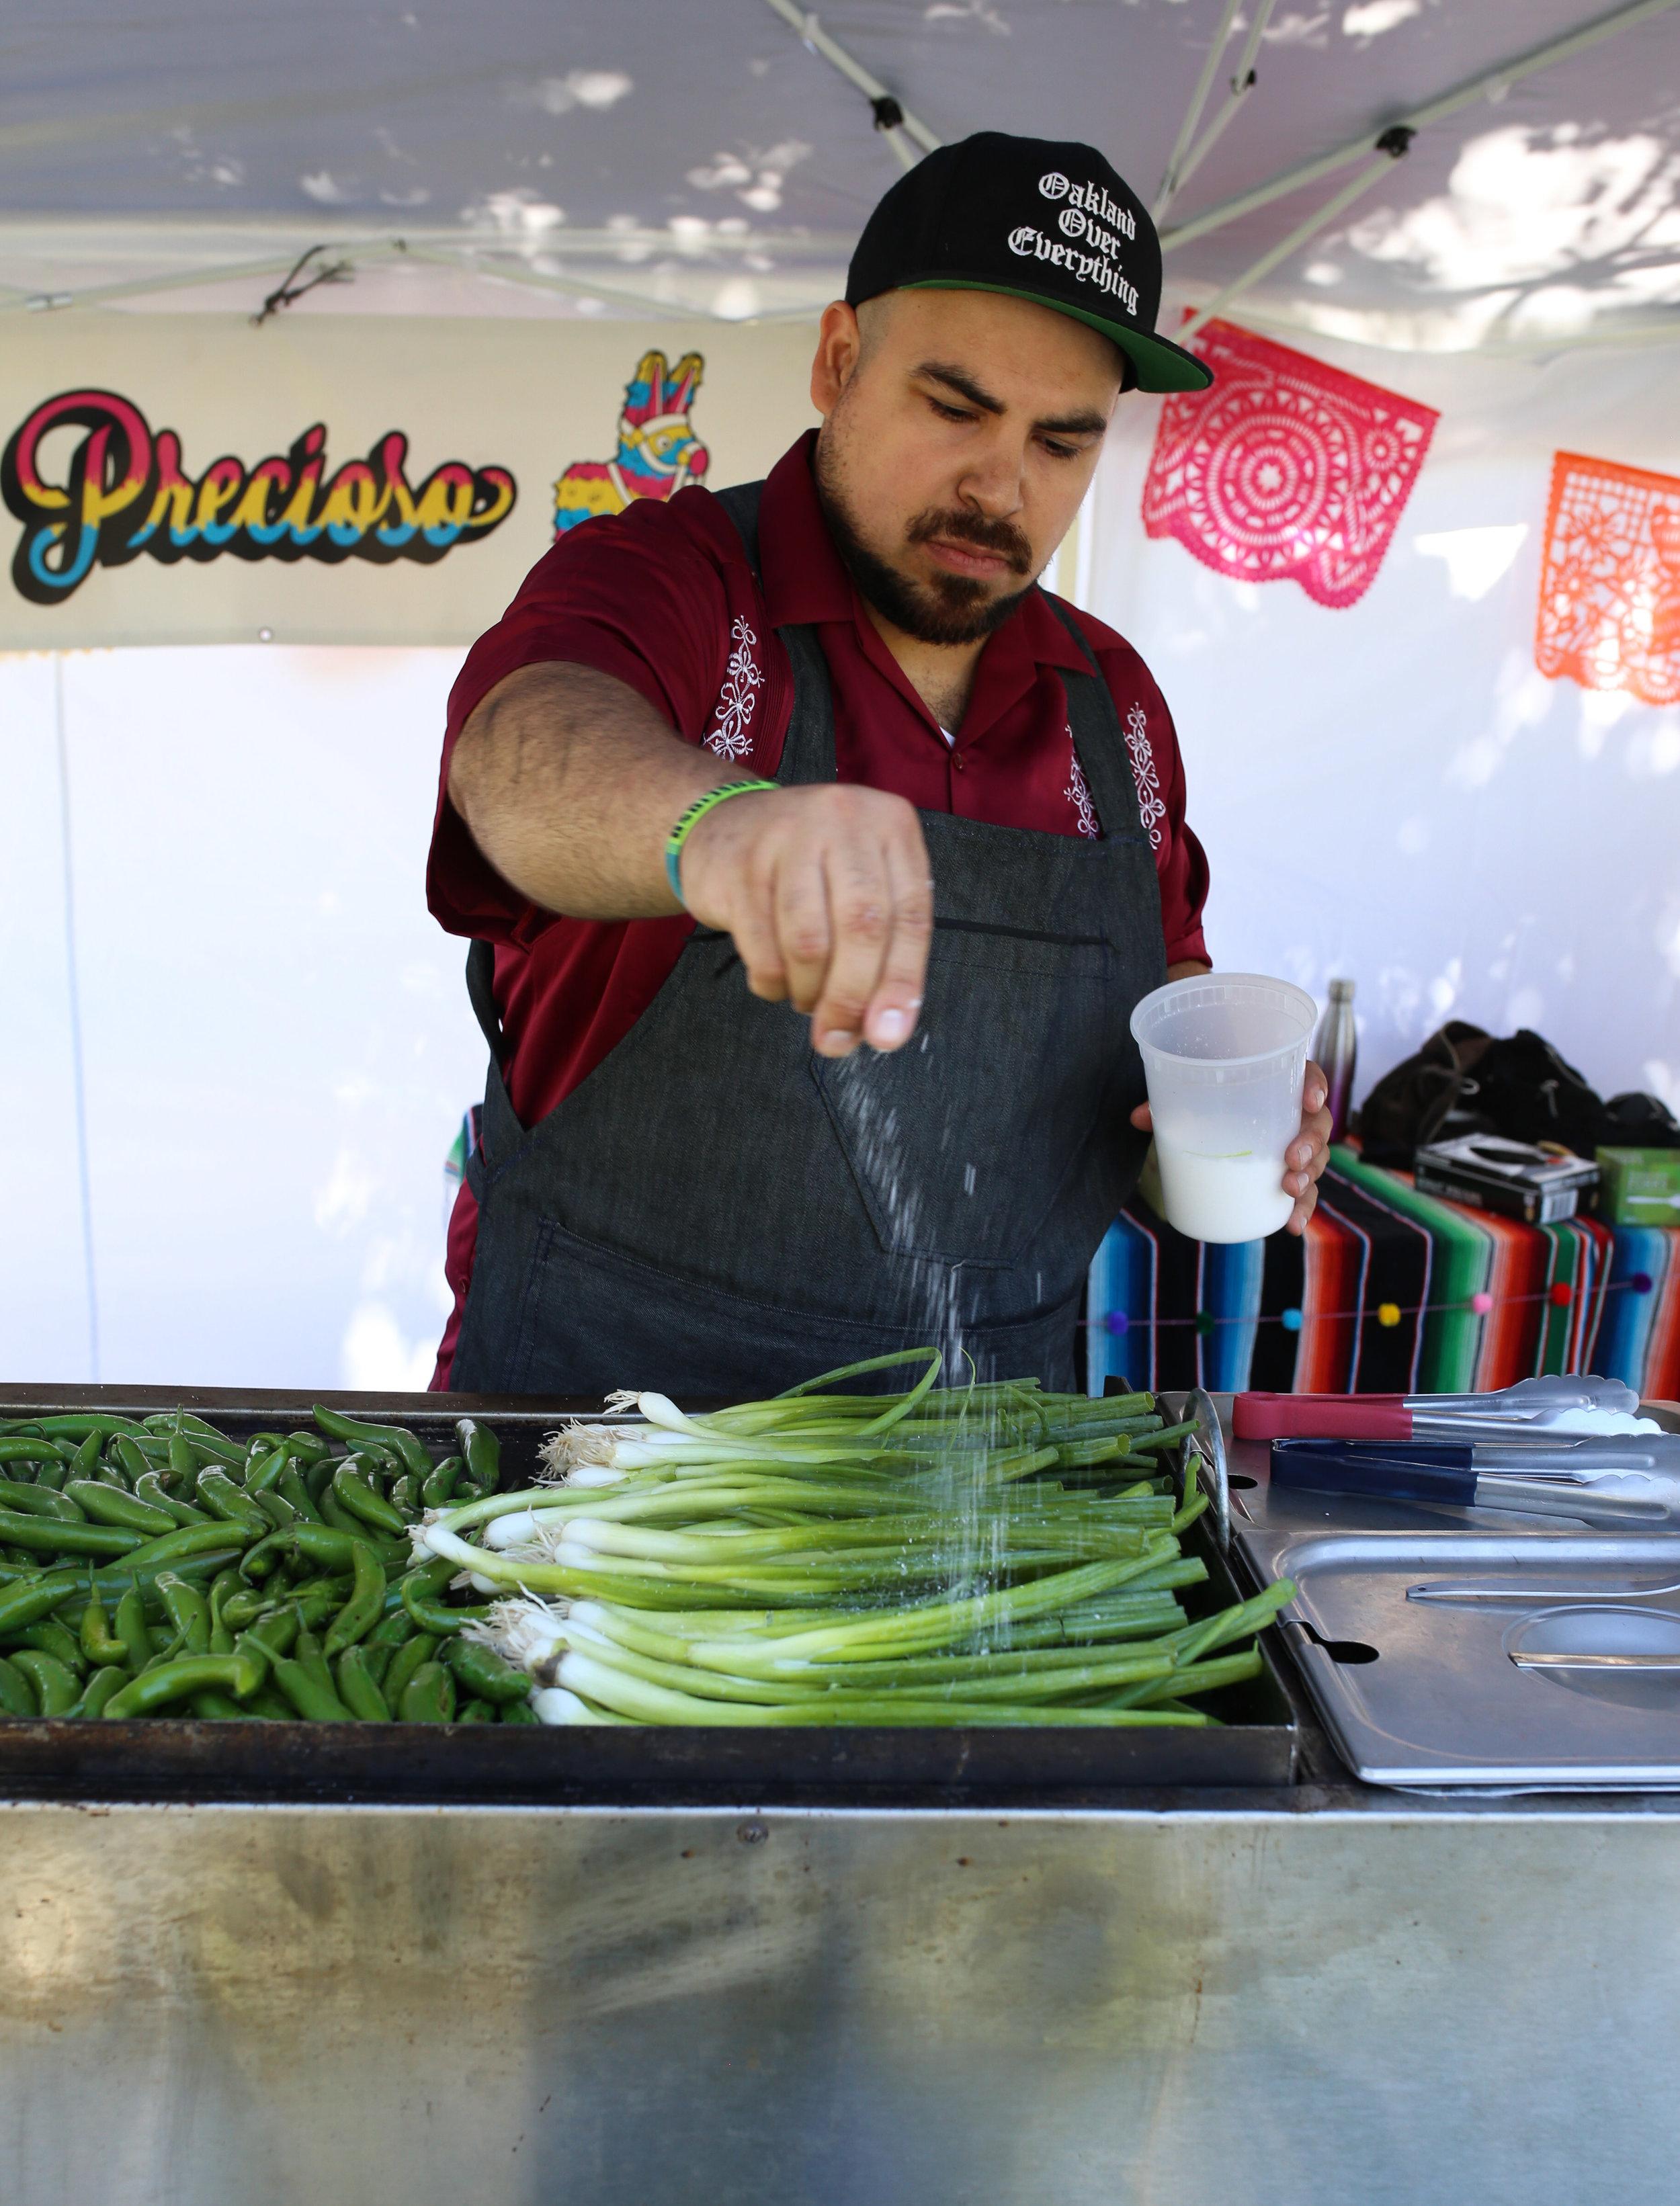 kristenmurakoshi-lifestyle-tacos-el-precioso-3.jpg